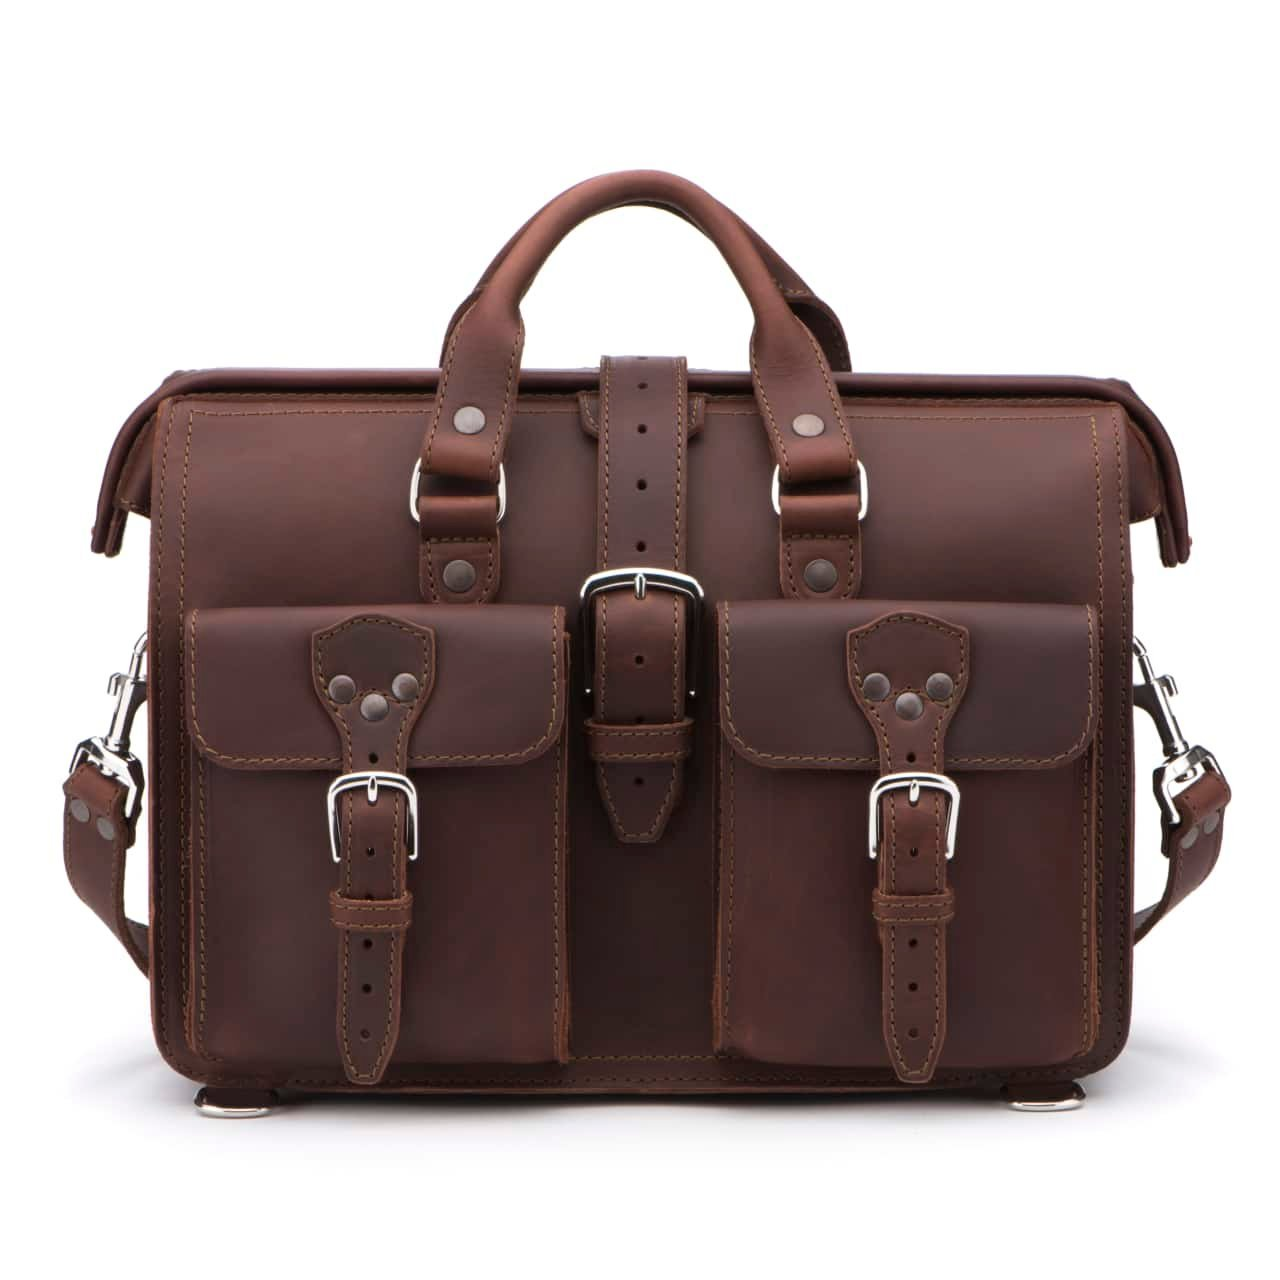 Saddleback Leather Co. Flight Bag 15-inch Full Grain Leather Expandable Laptop Briefcase for Men Includes 100 Year Warranty by Saddleback Leather Co. (Image #2)